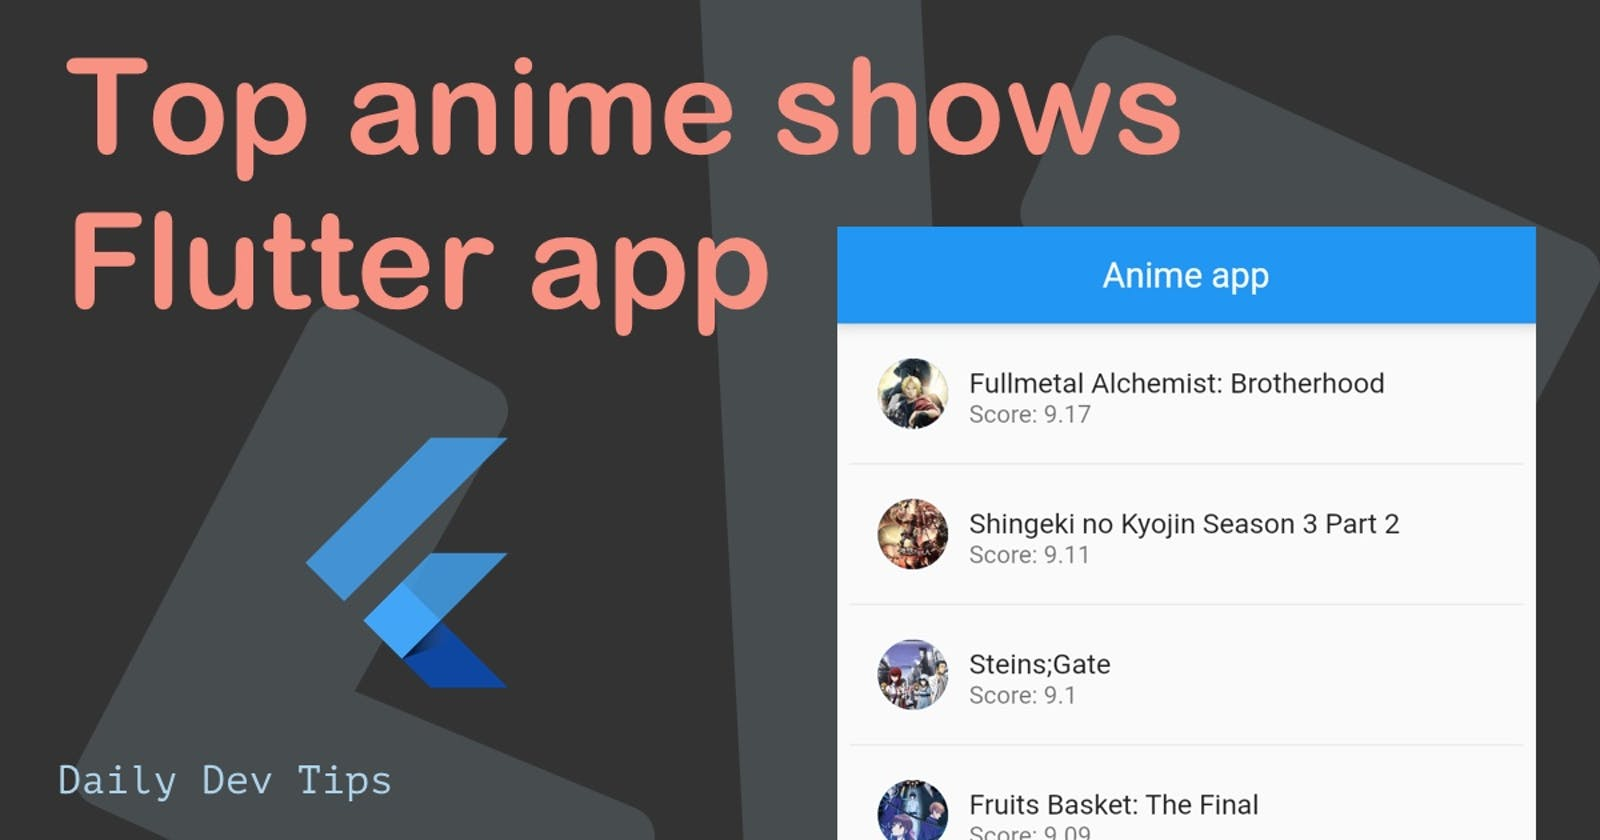 Top anime shows Flutter app